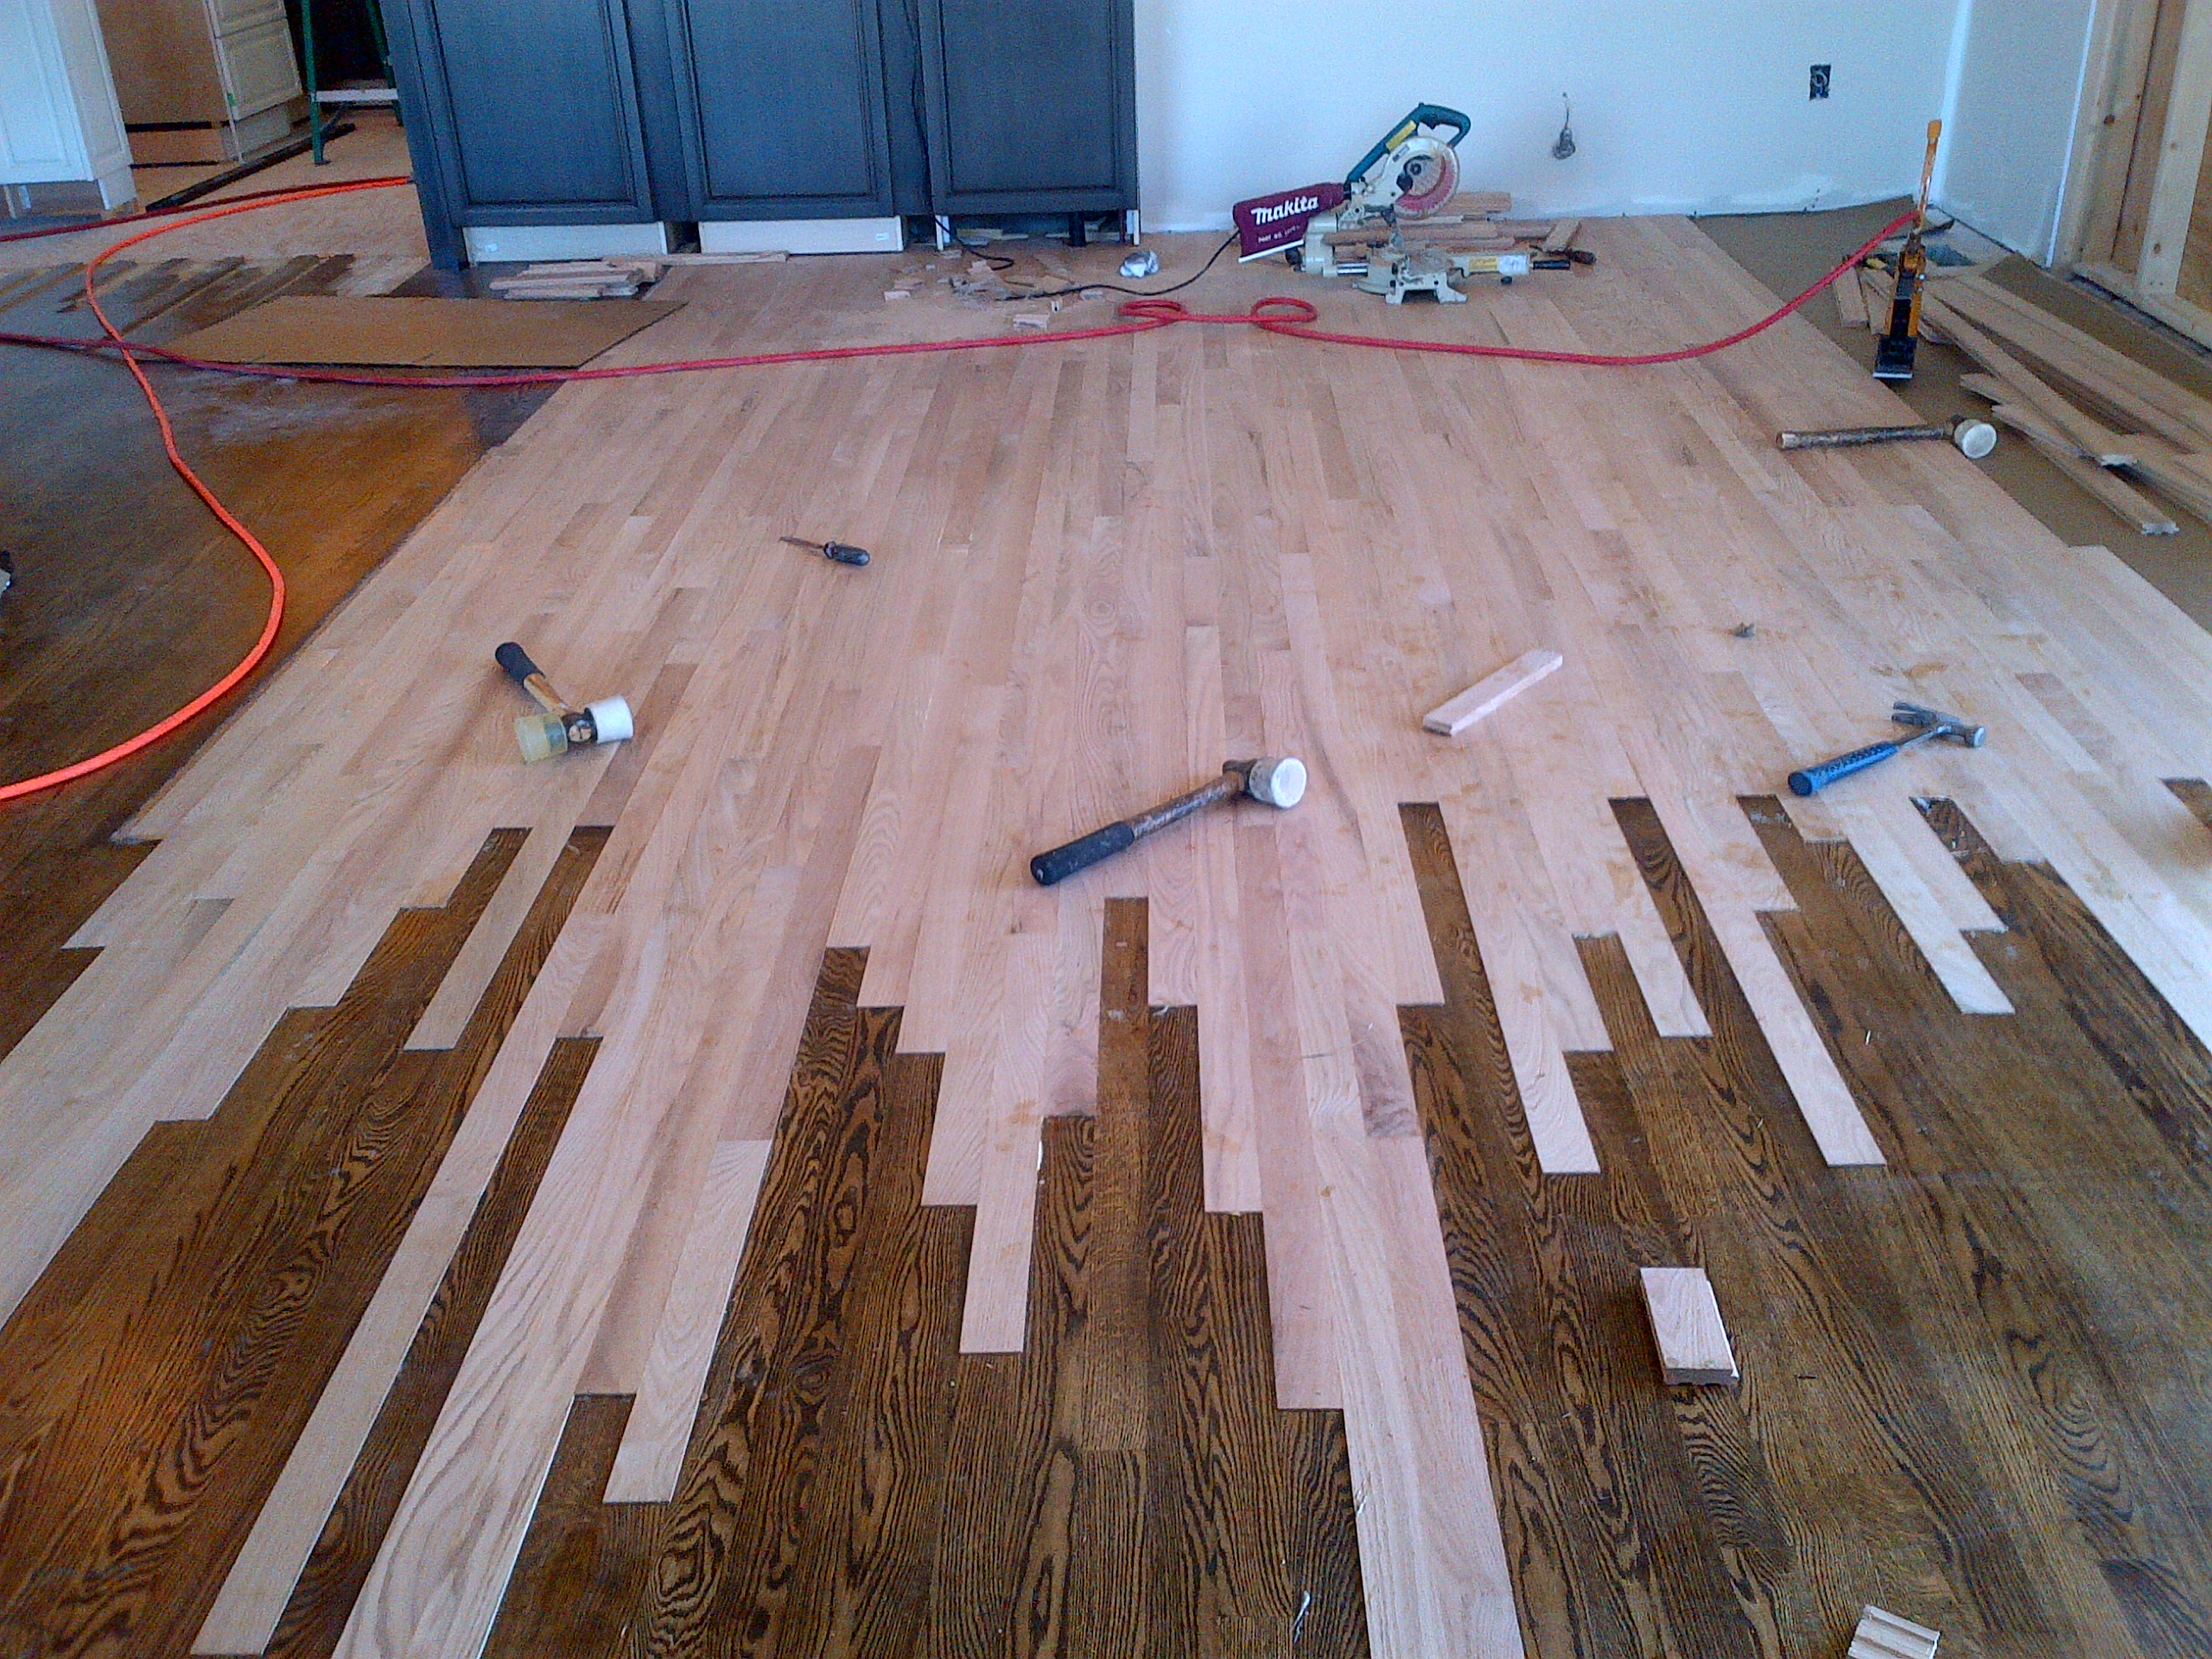 AHF Hardwood Floor Repair Vancouver BC, Professsional wooden